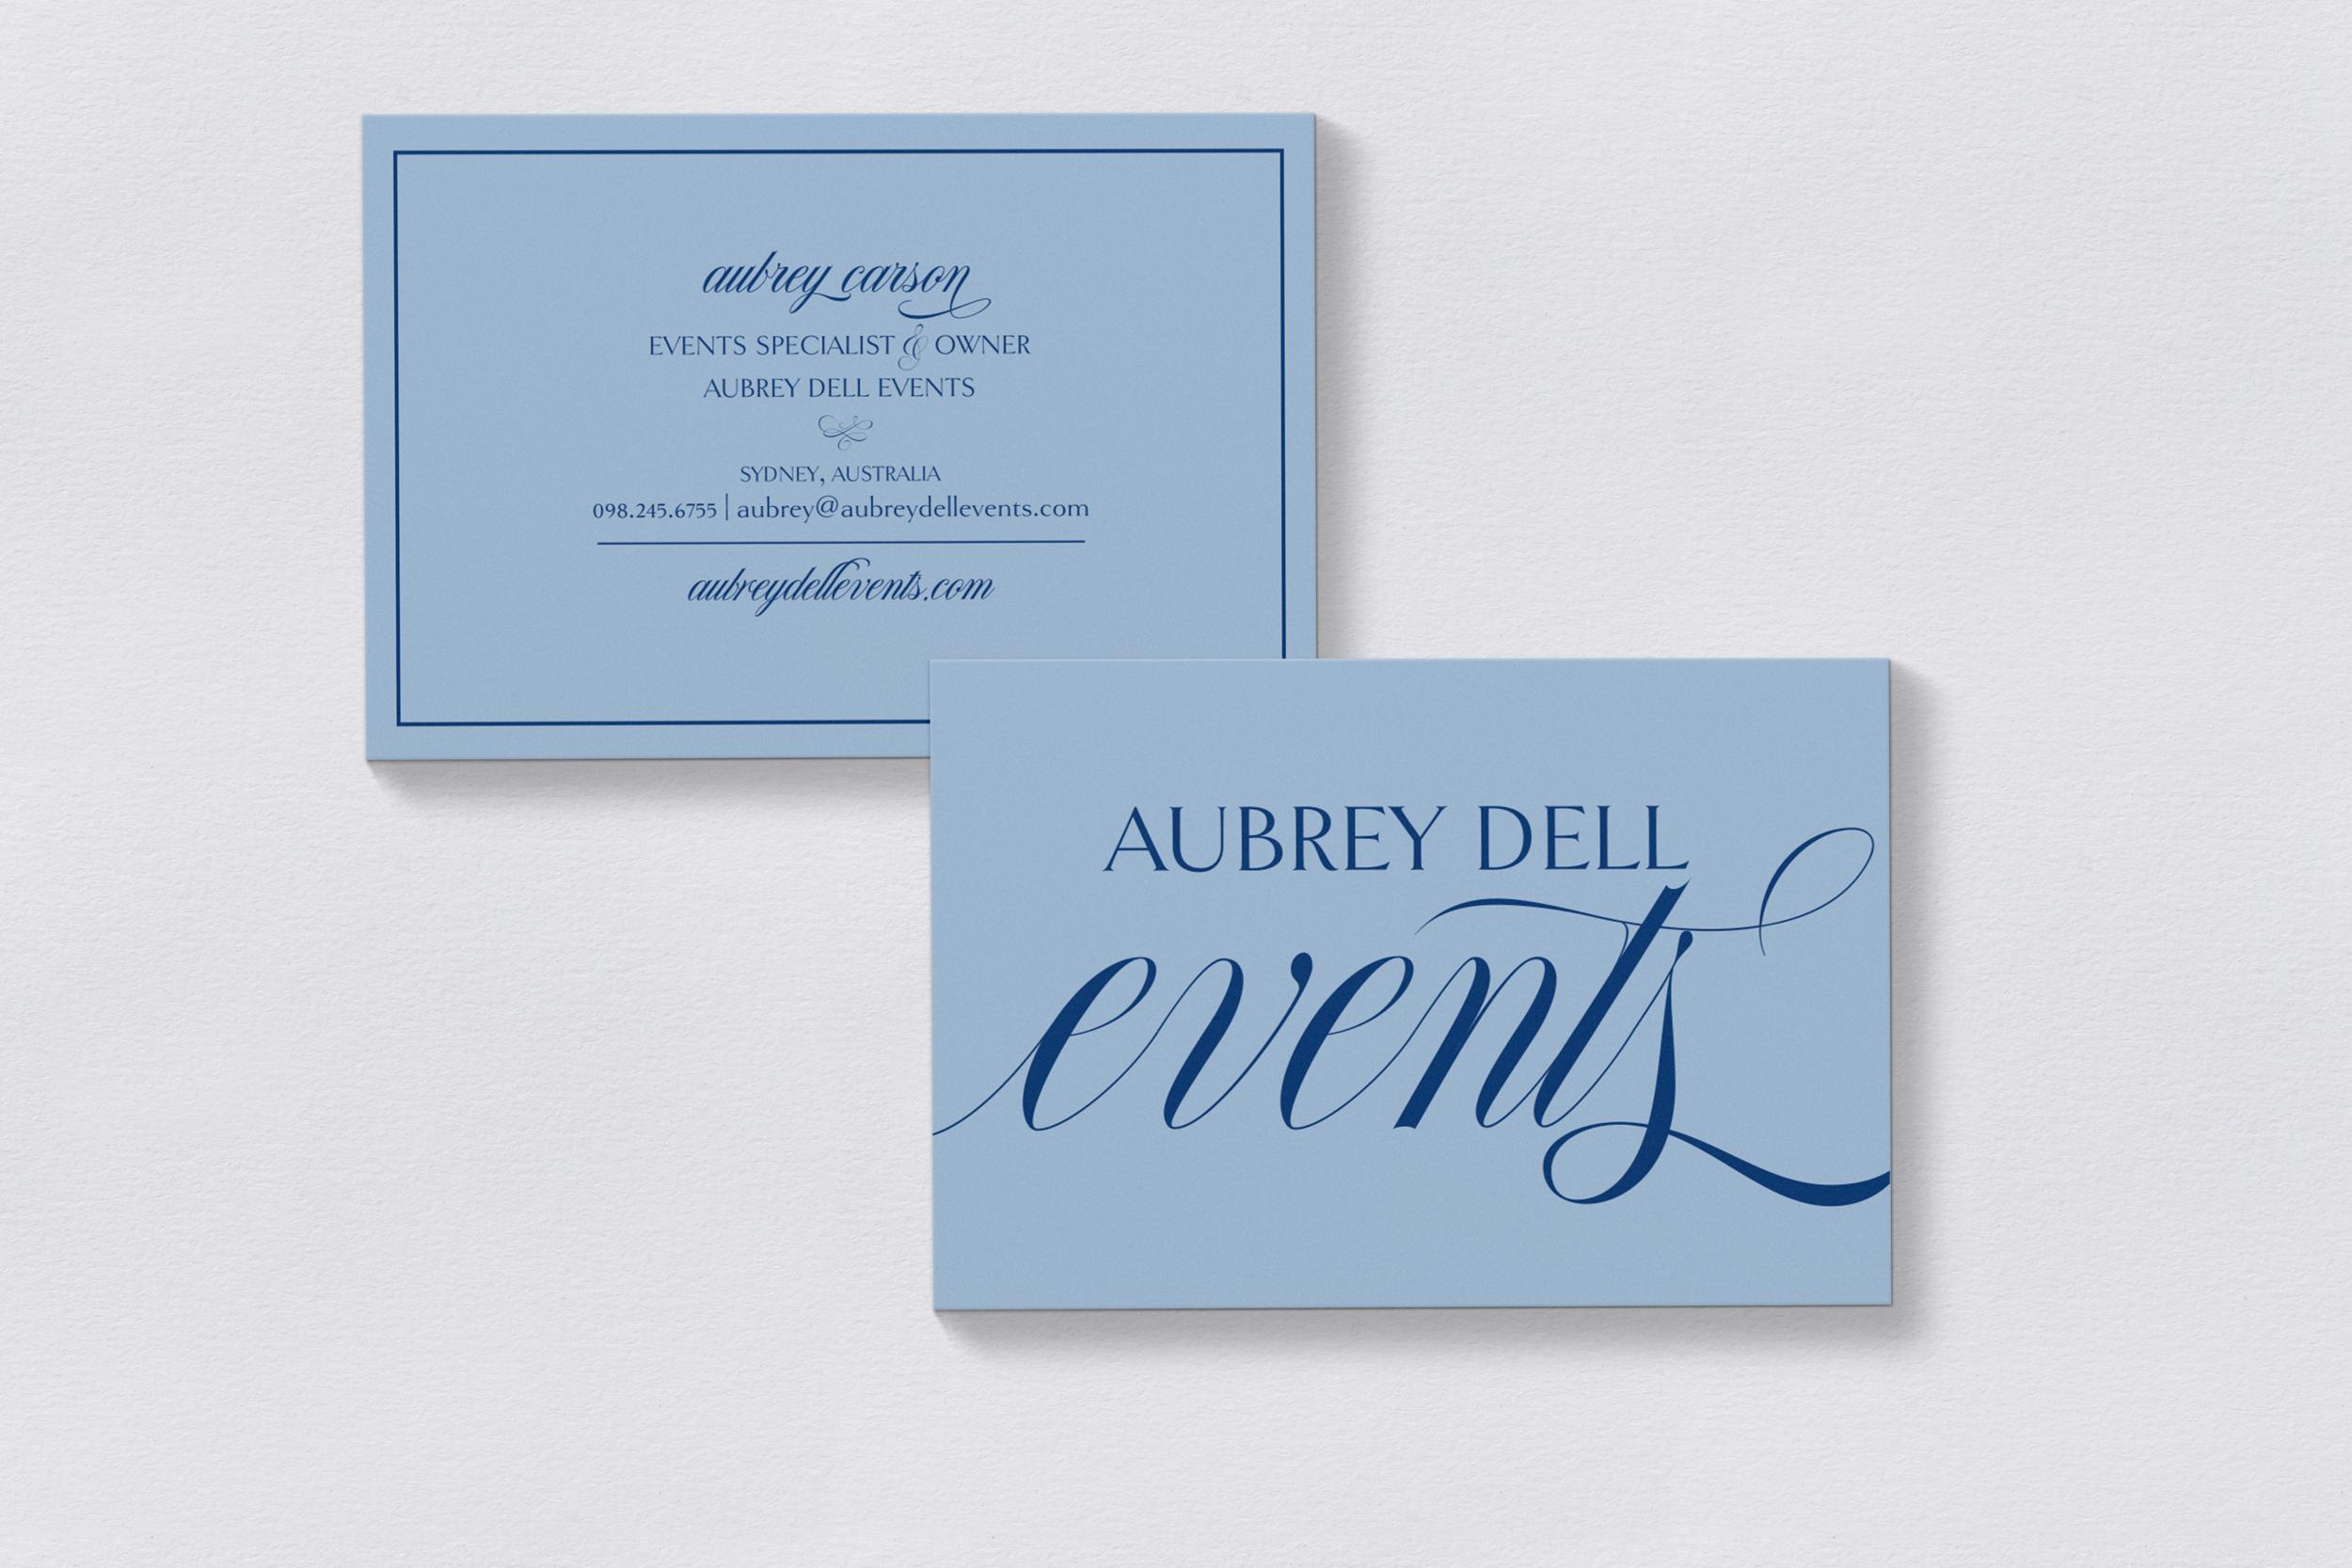 Aubrey Dell - Bcard.png